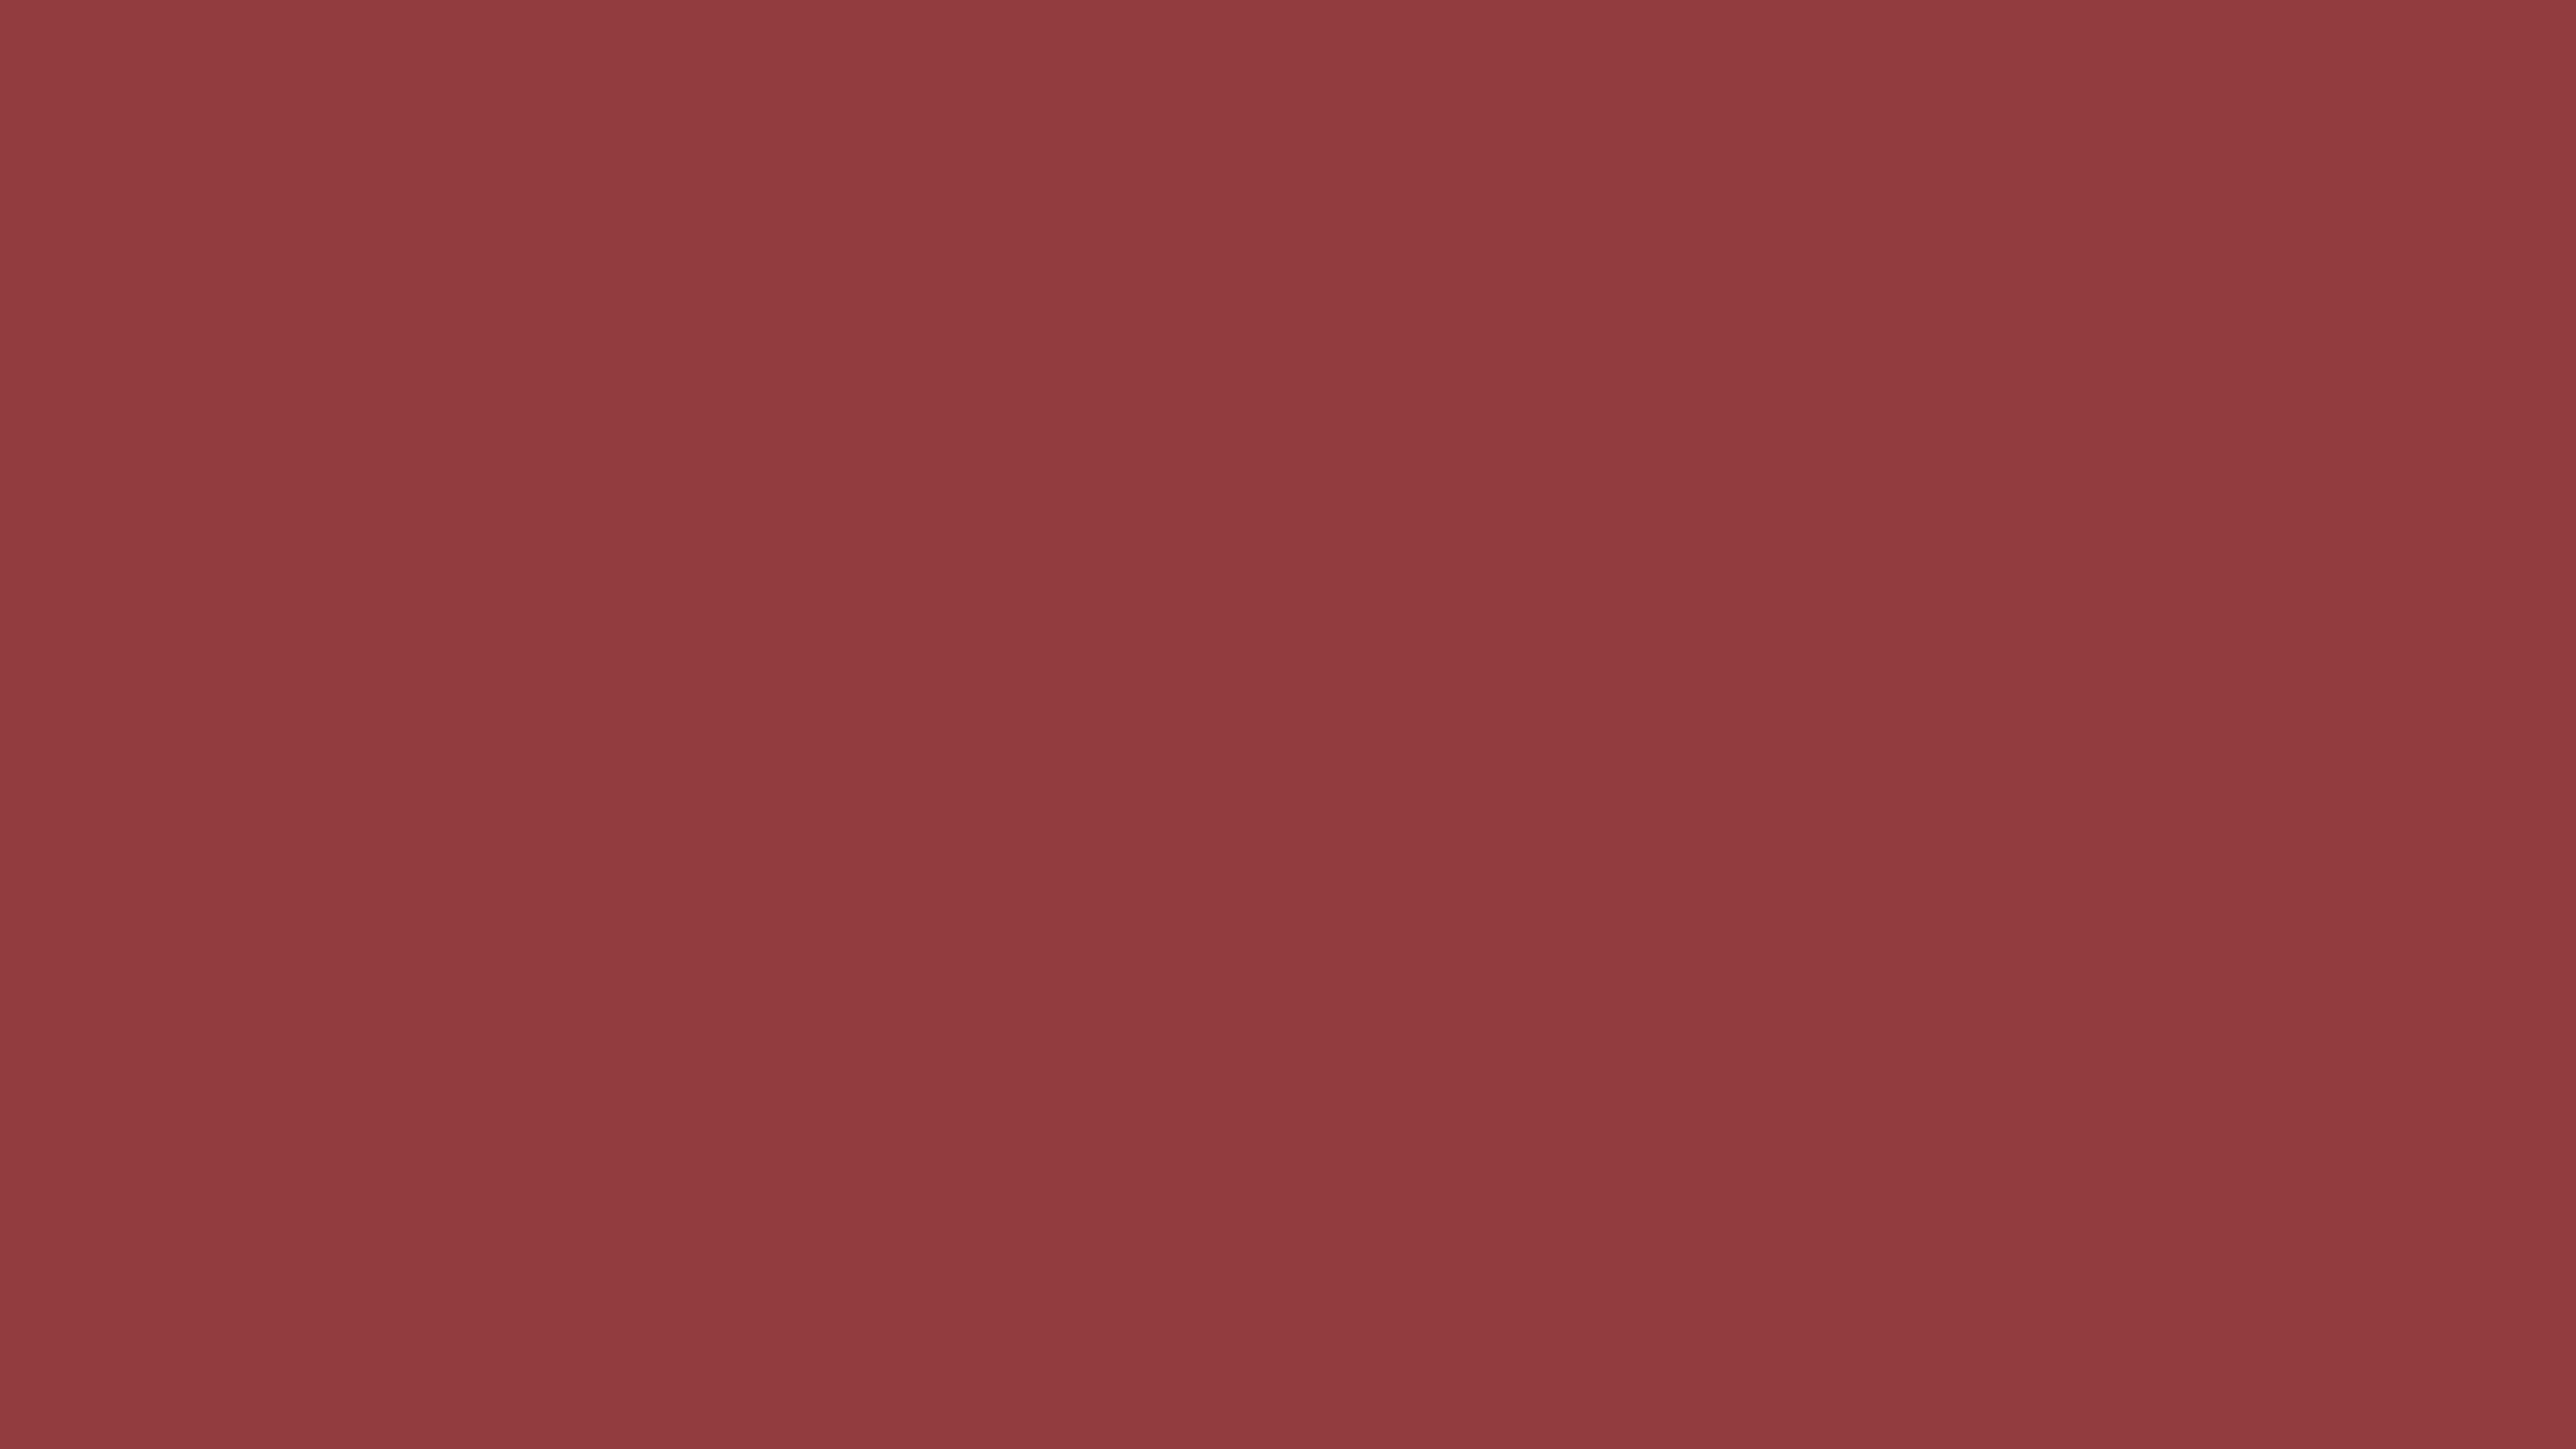 4096x2304 Smokey Topaz Solid Color Background